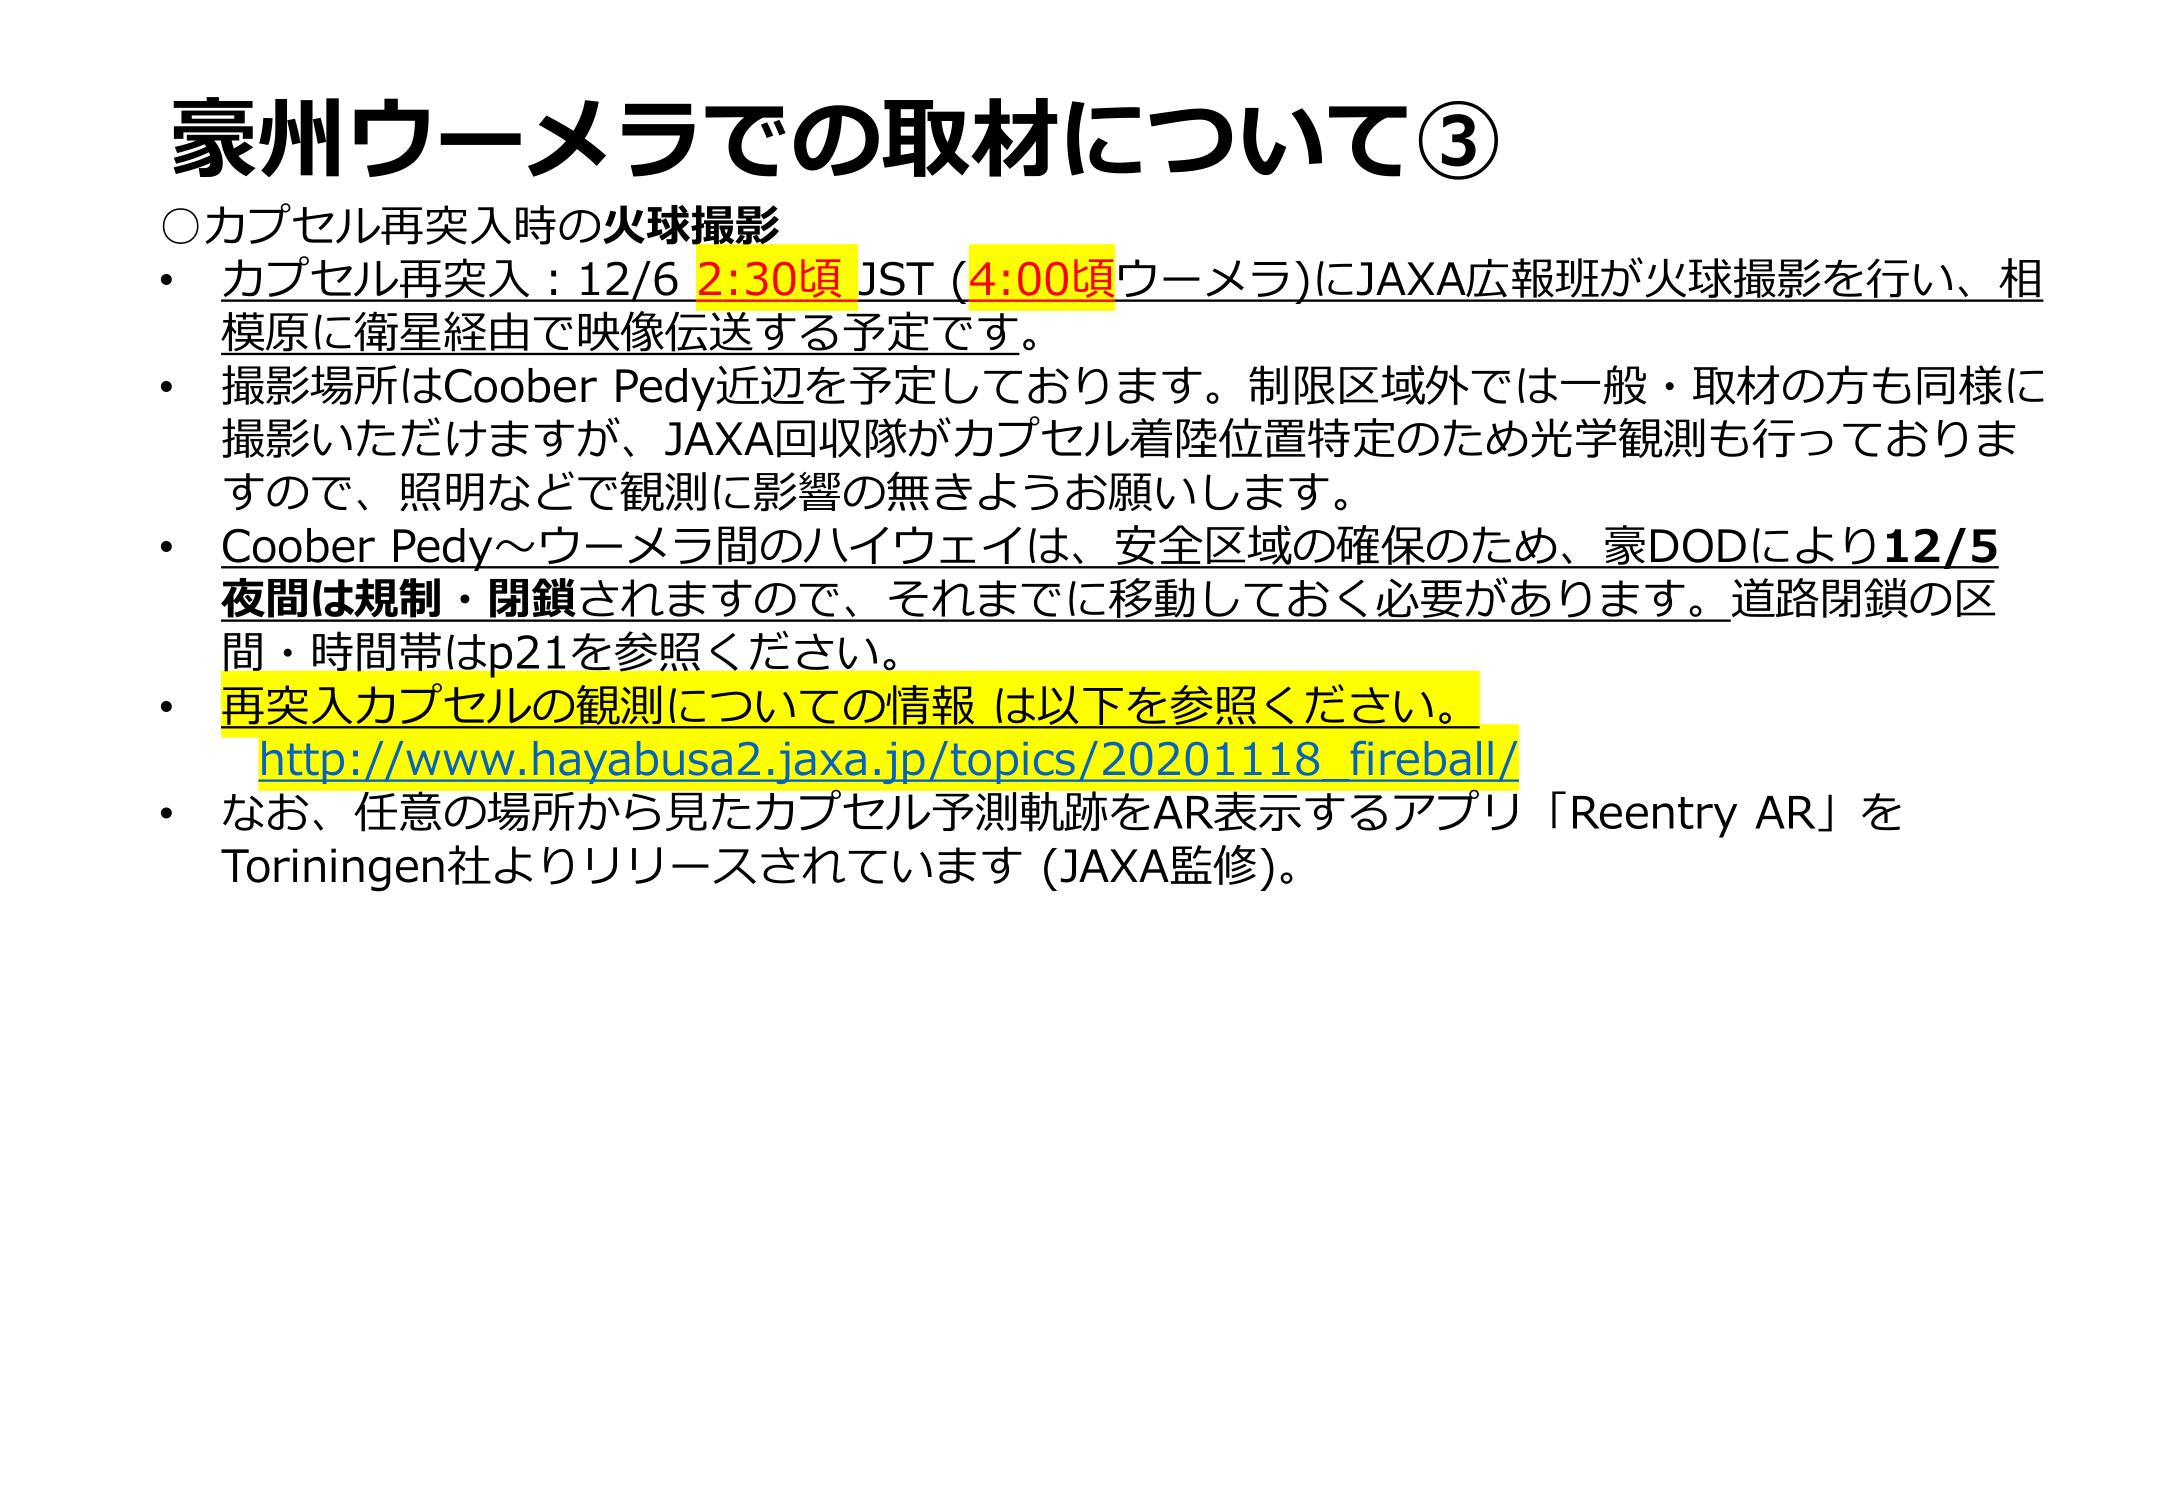 f:id:Imamura:20201130154431p:plain:h250